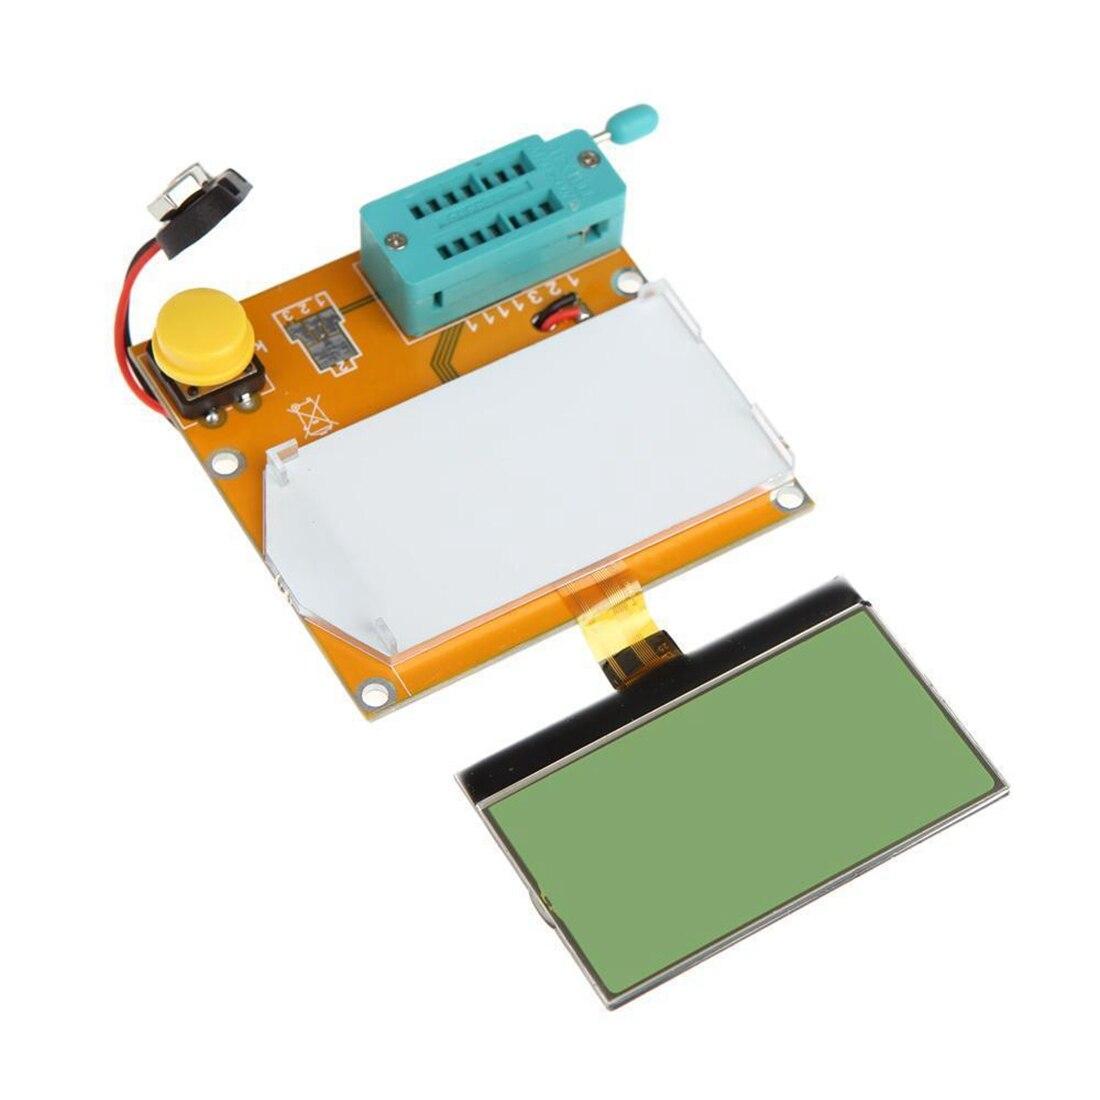 LCR-T3 Transistor Tester Diode Triode Capactitance ESR LCR Meter